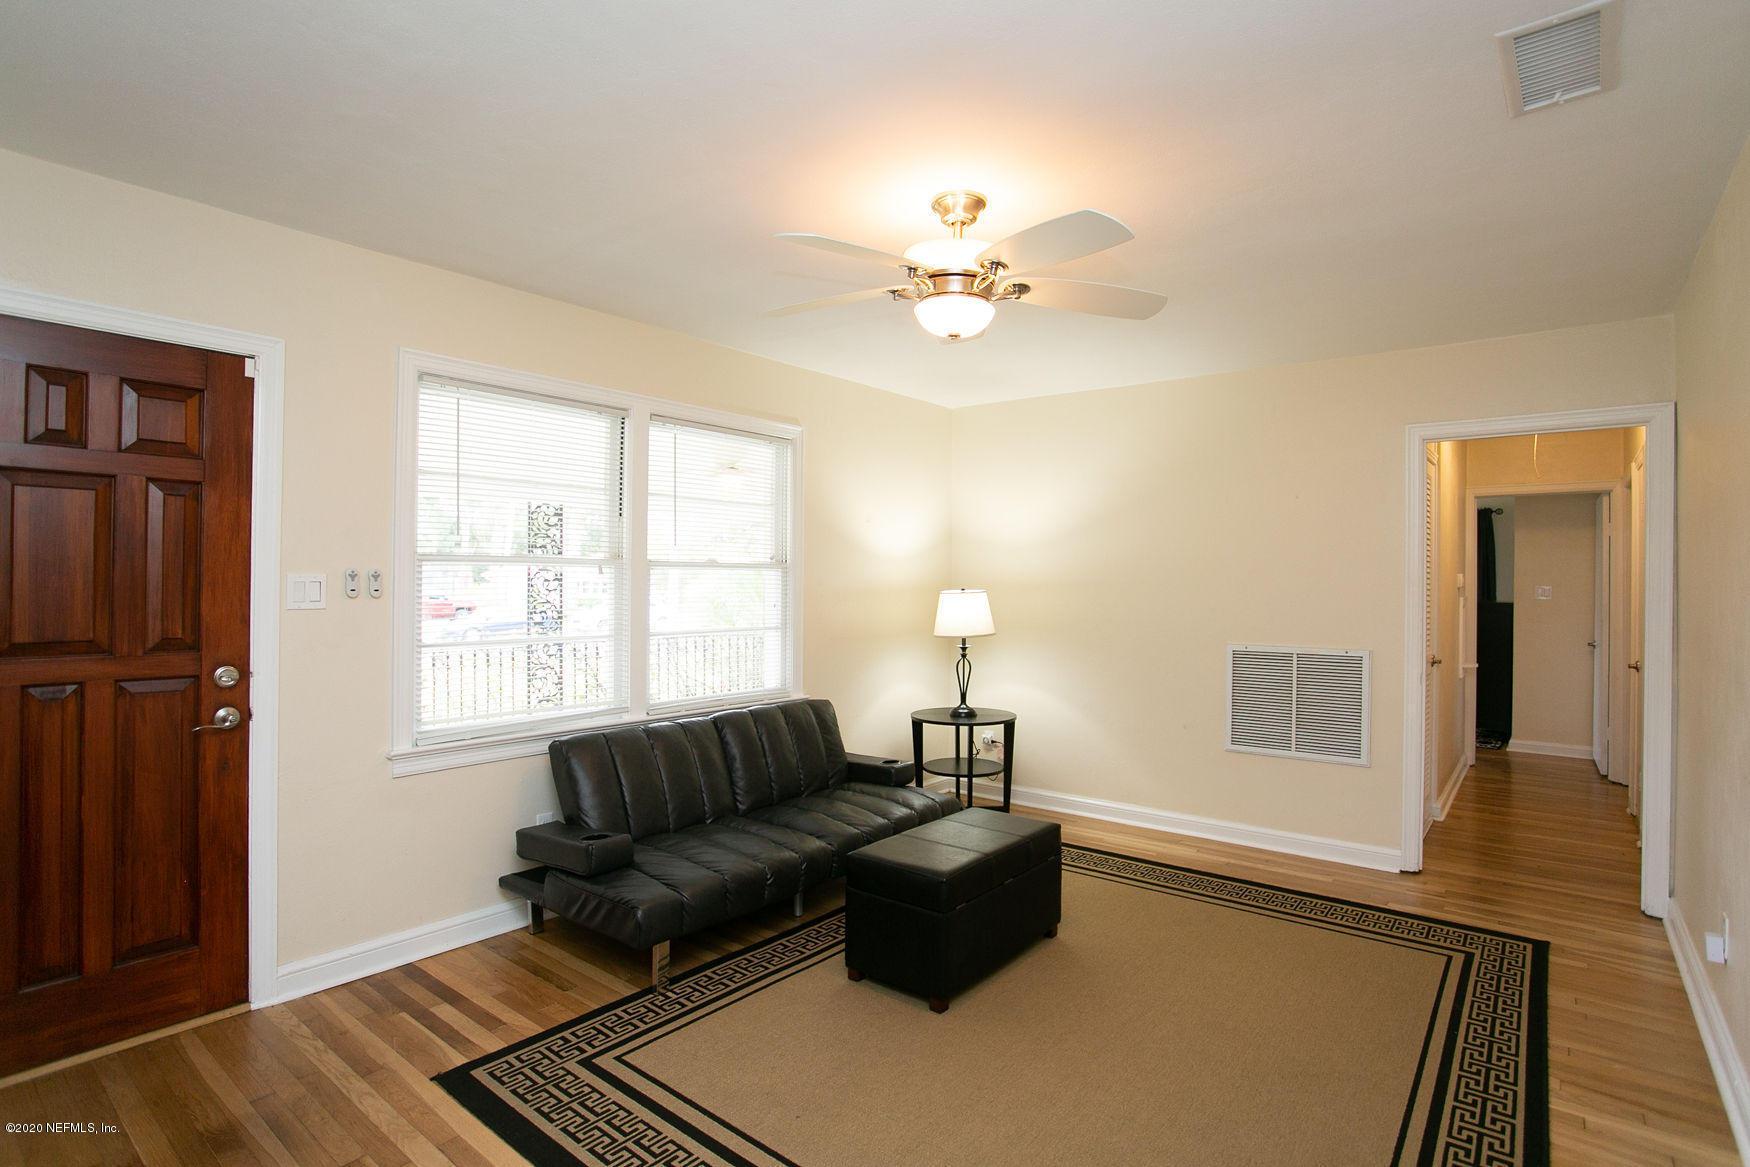 56 VALENCIA, ST AUGUSTINE, FLORIDA 32084, 3 Bedrooms Bedrooms, ,2 BathroomsBathrooms,Residential,For sale,VALENCIA,1036422